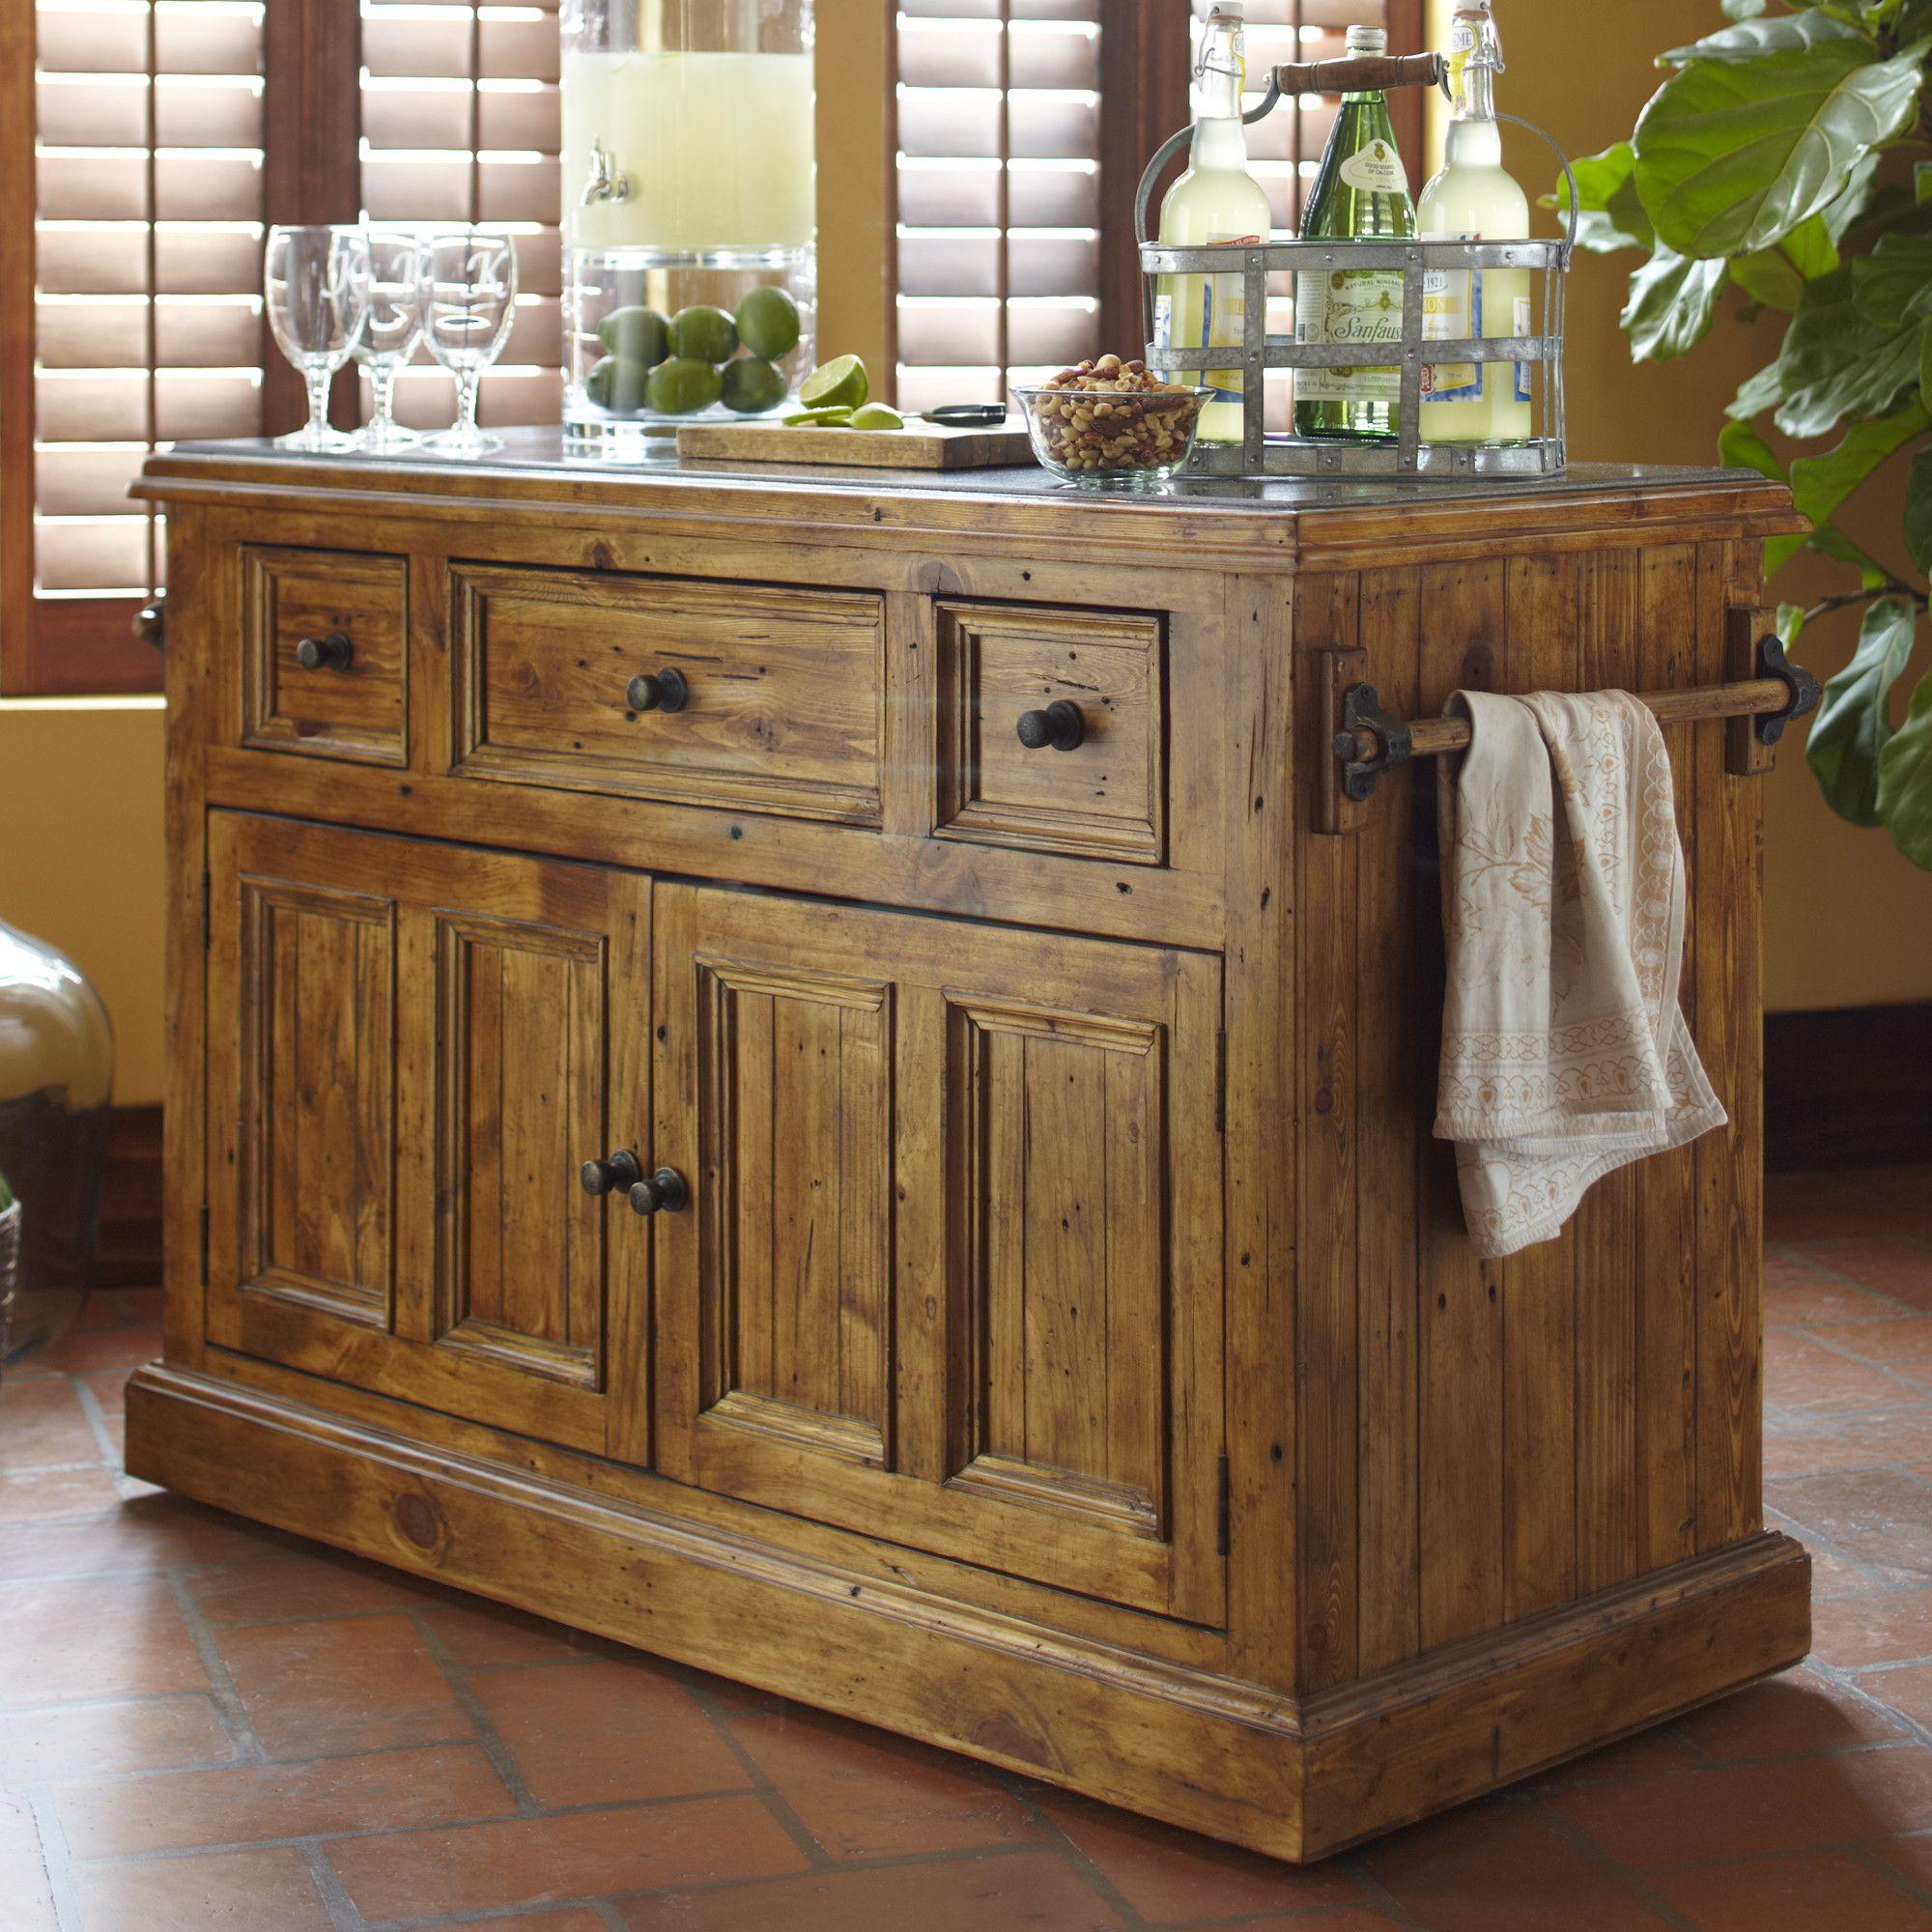 Harris Kitchen Island With Granite Top Rustic Kitchen Kitchen Island With Granite Top Interior Design Kitchen